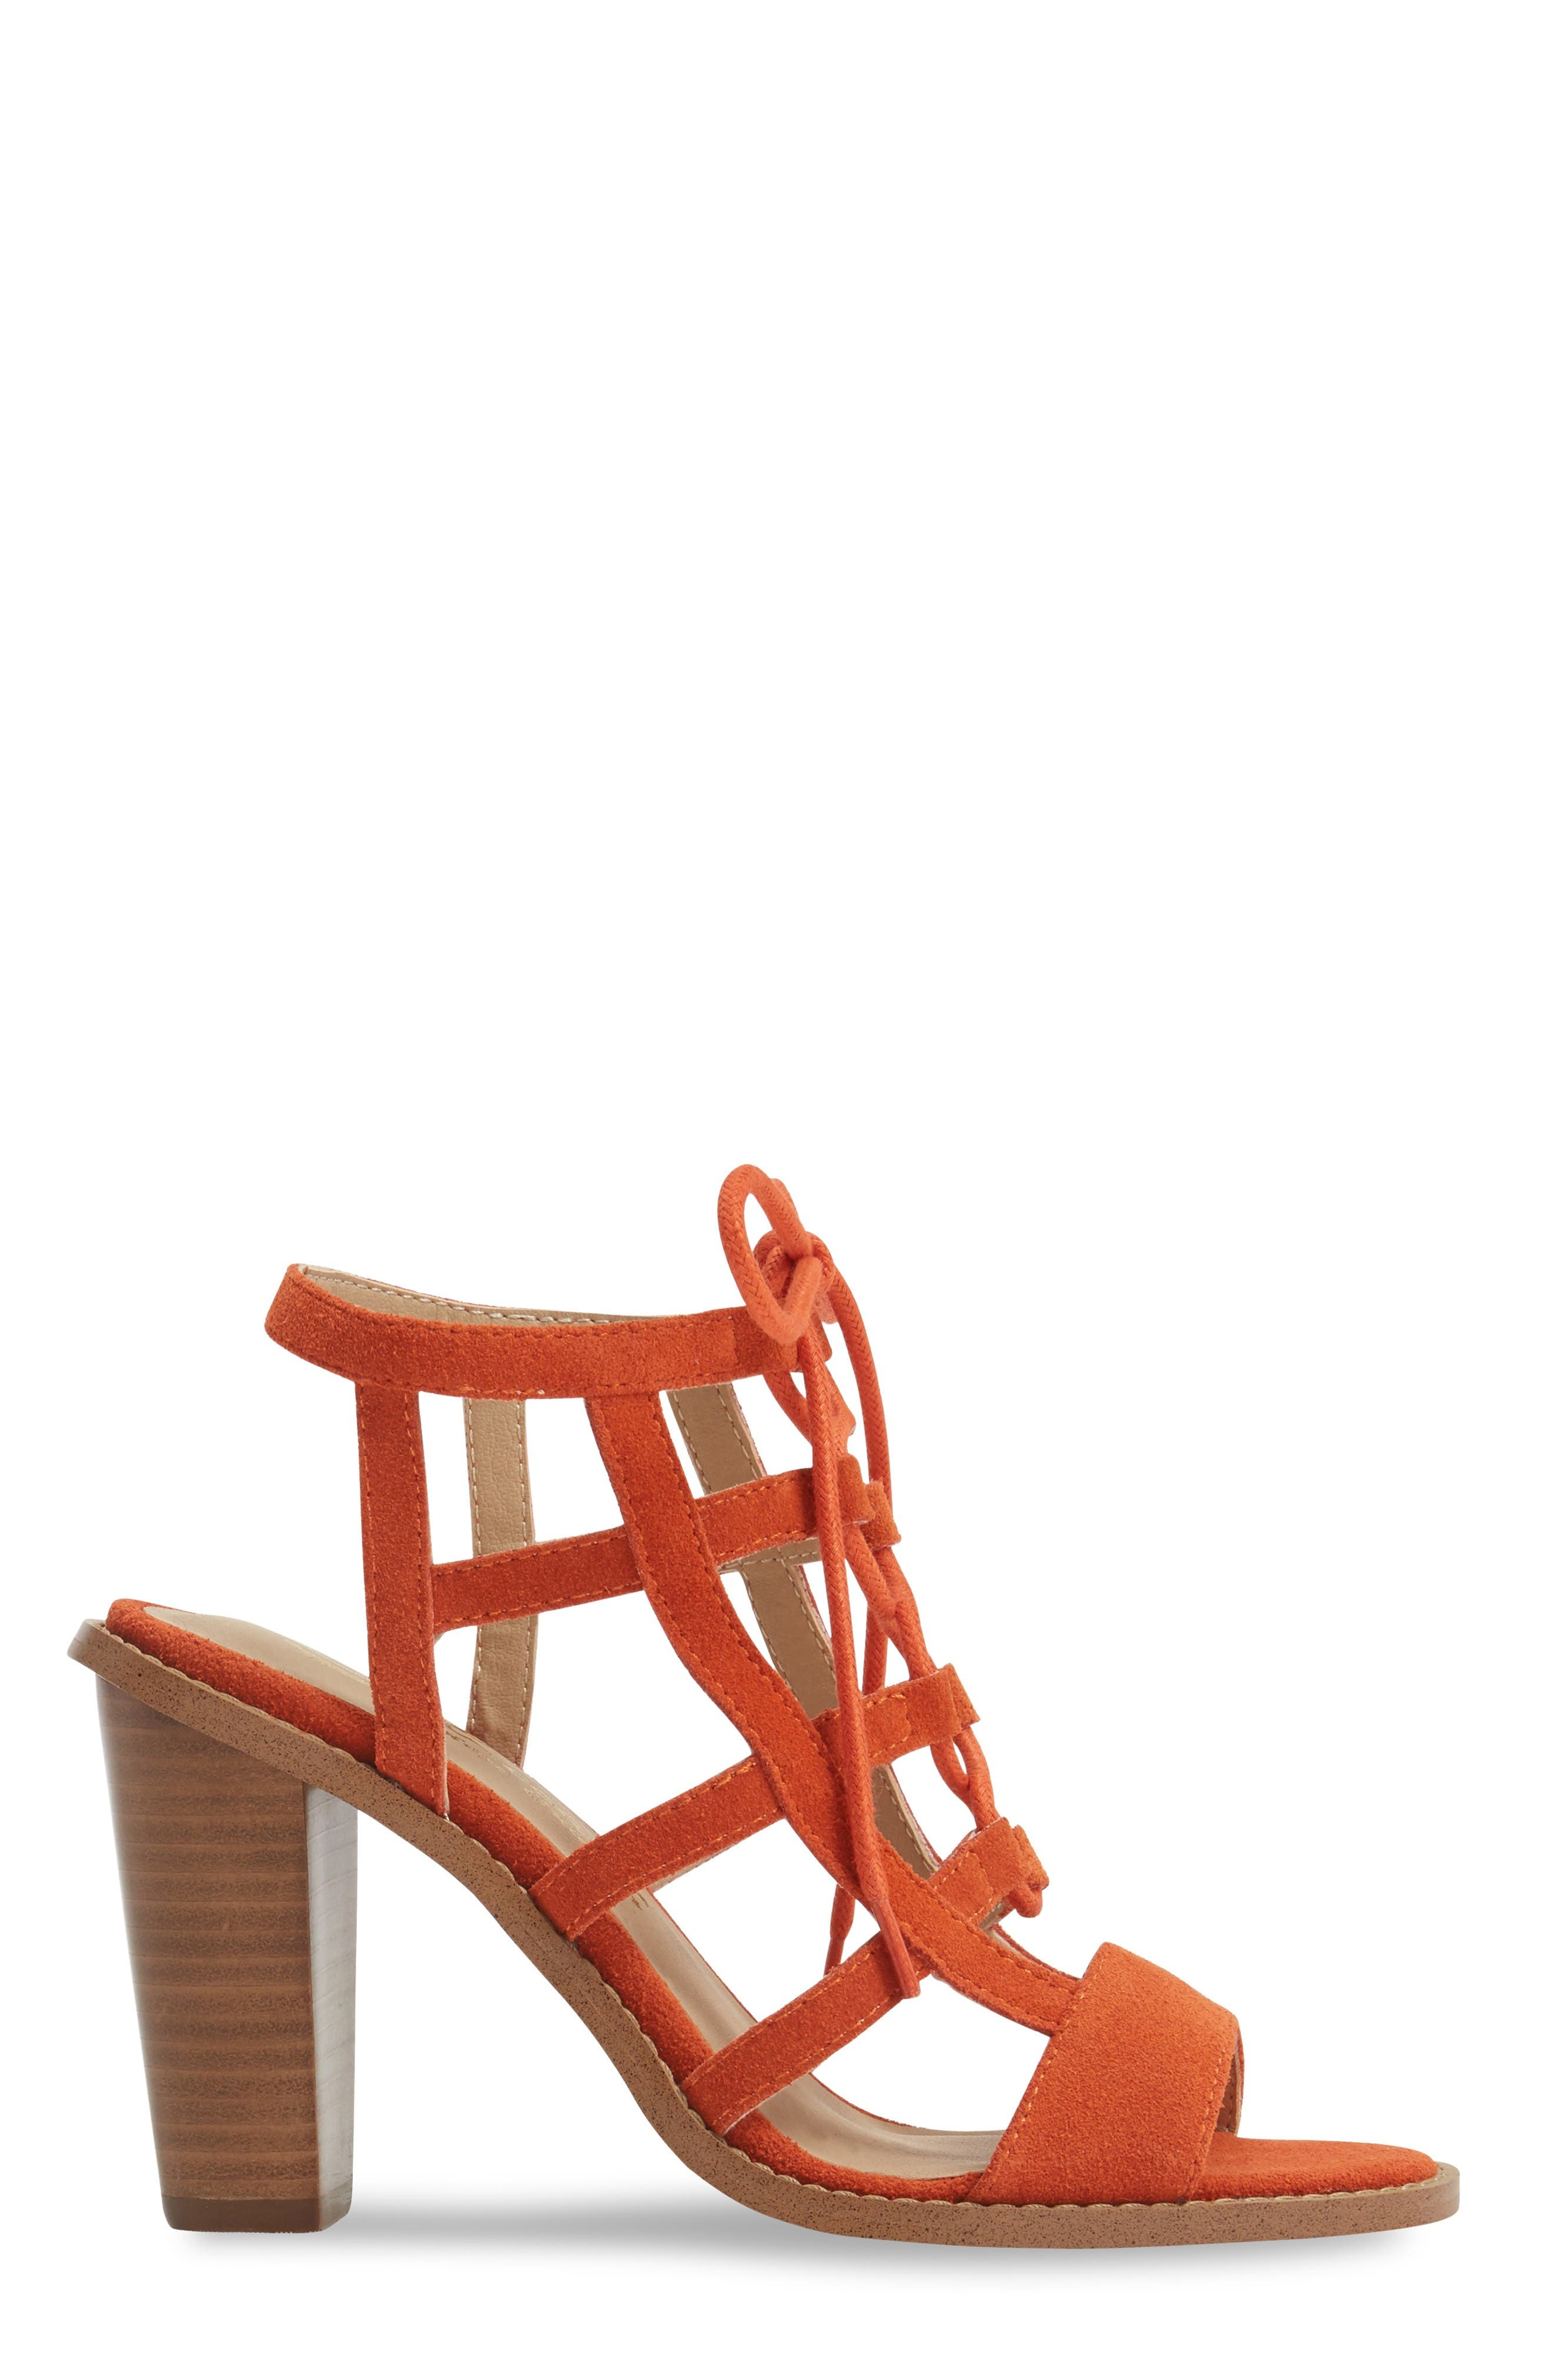 Sanni Cage Sandal,                             Alternate thumbnail 3, color,                             Orange Leather